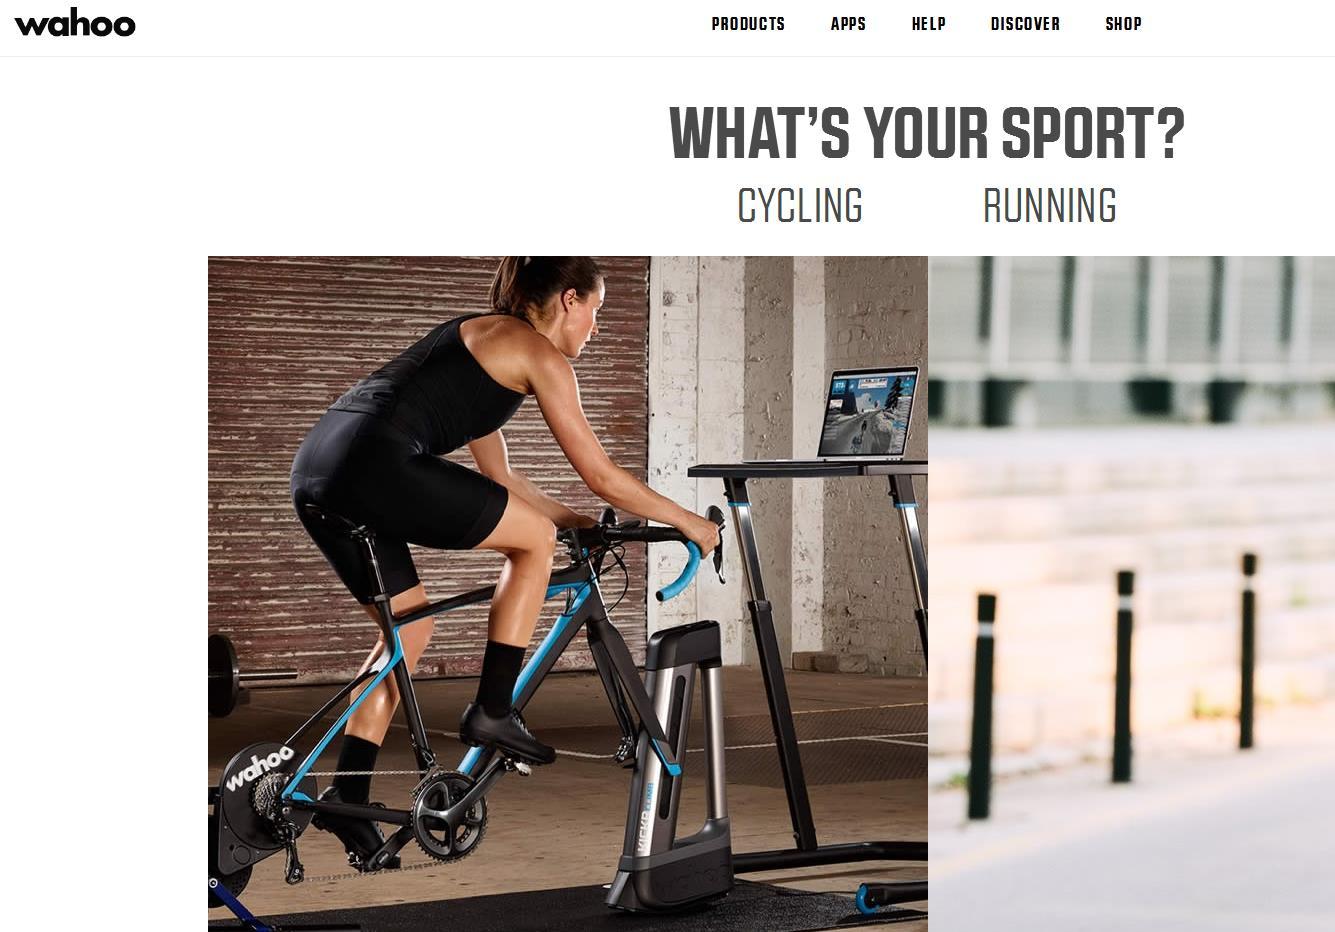 私募基金 Norwest 投资智能运动设备开发公司 Wahoo Fitness